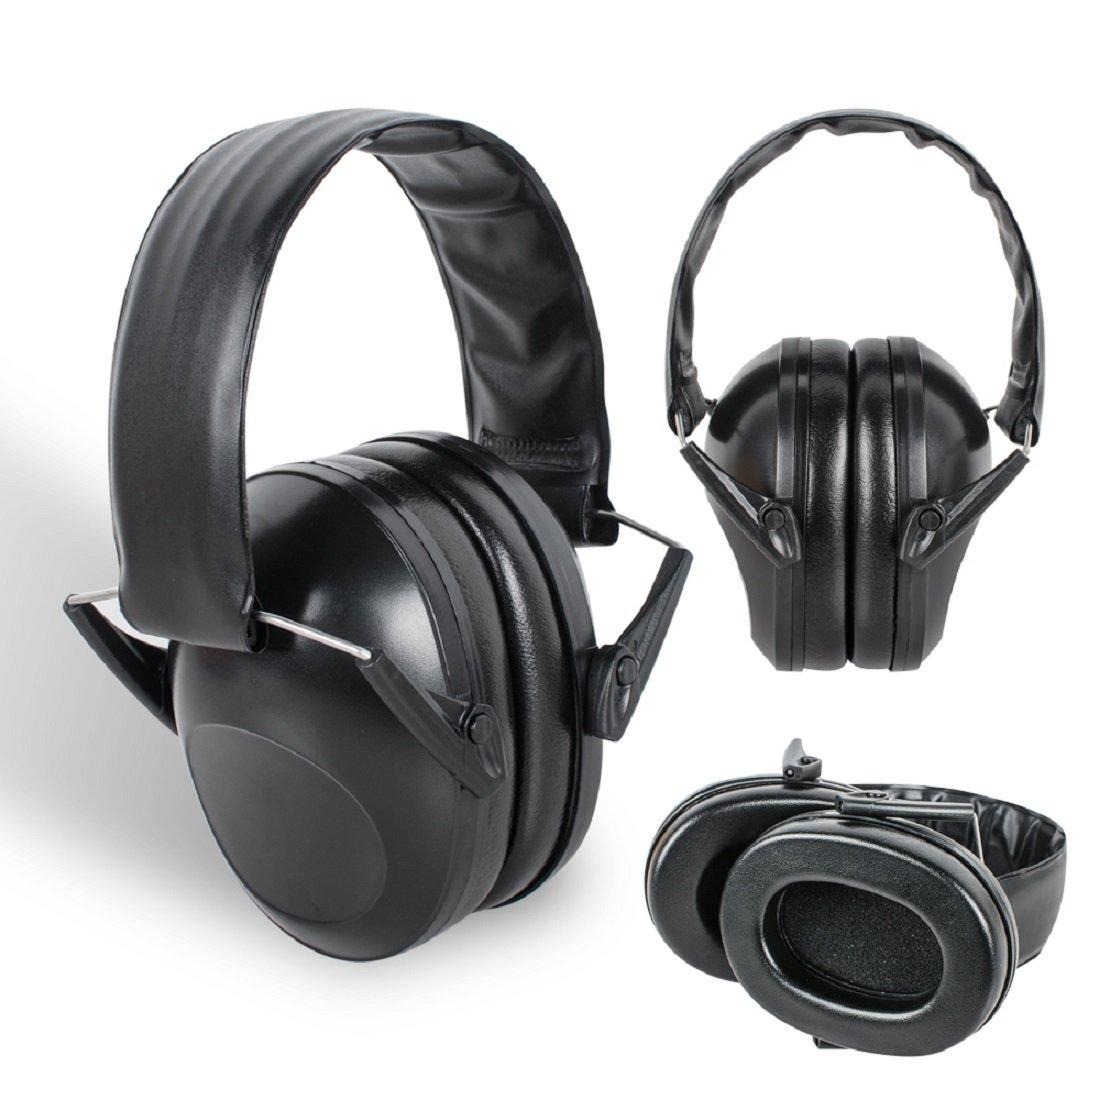 Tinsay 21dB Tactical Protective Earmuffs Outdoor Hunting Shooting Supplies Noise Earmuffs Hearing Protection Earmuffs Black